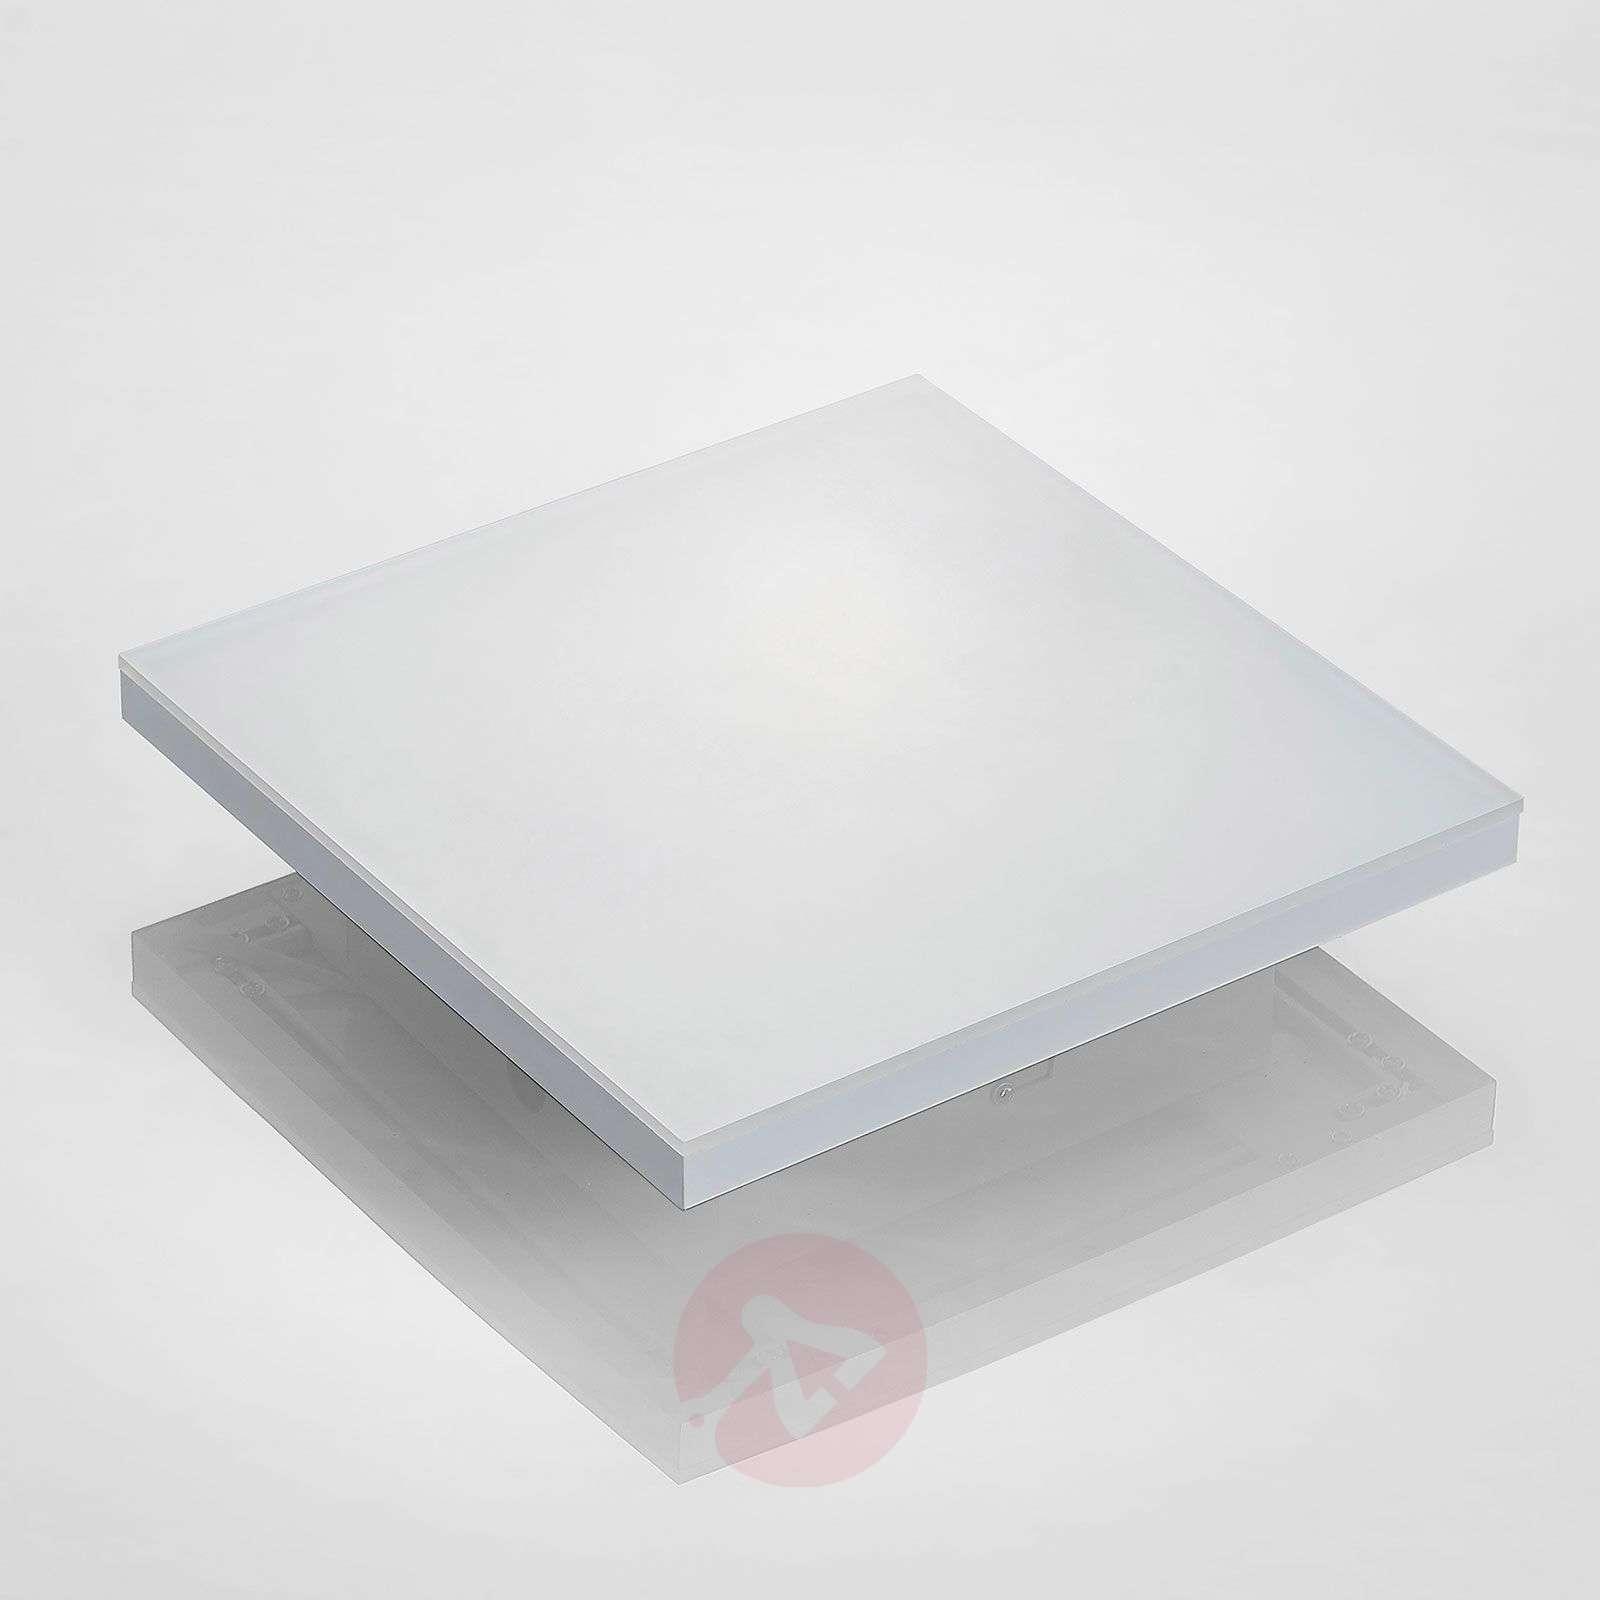 Blaan CCT LED panel with remote, 39.5 x 39.5cm-9624327-01